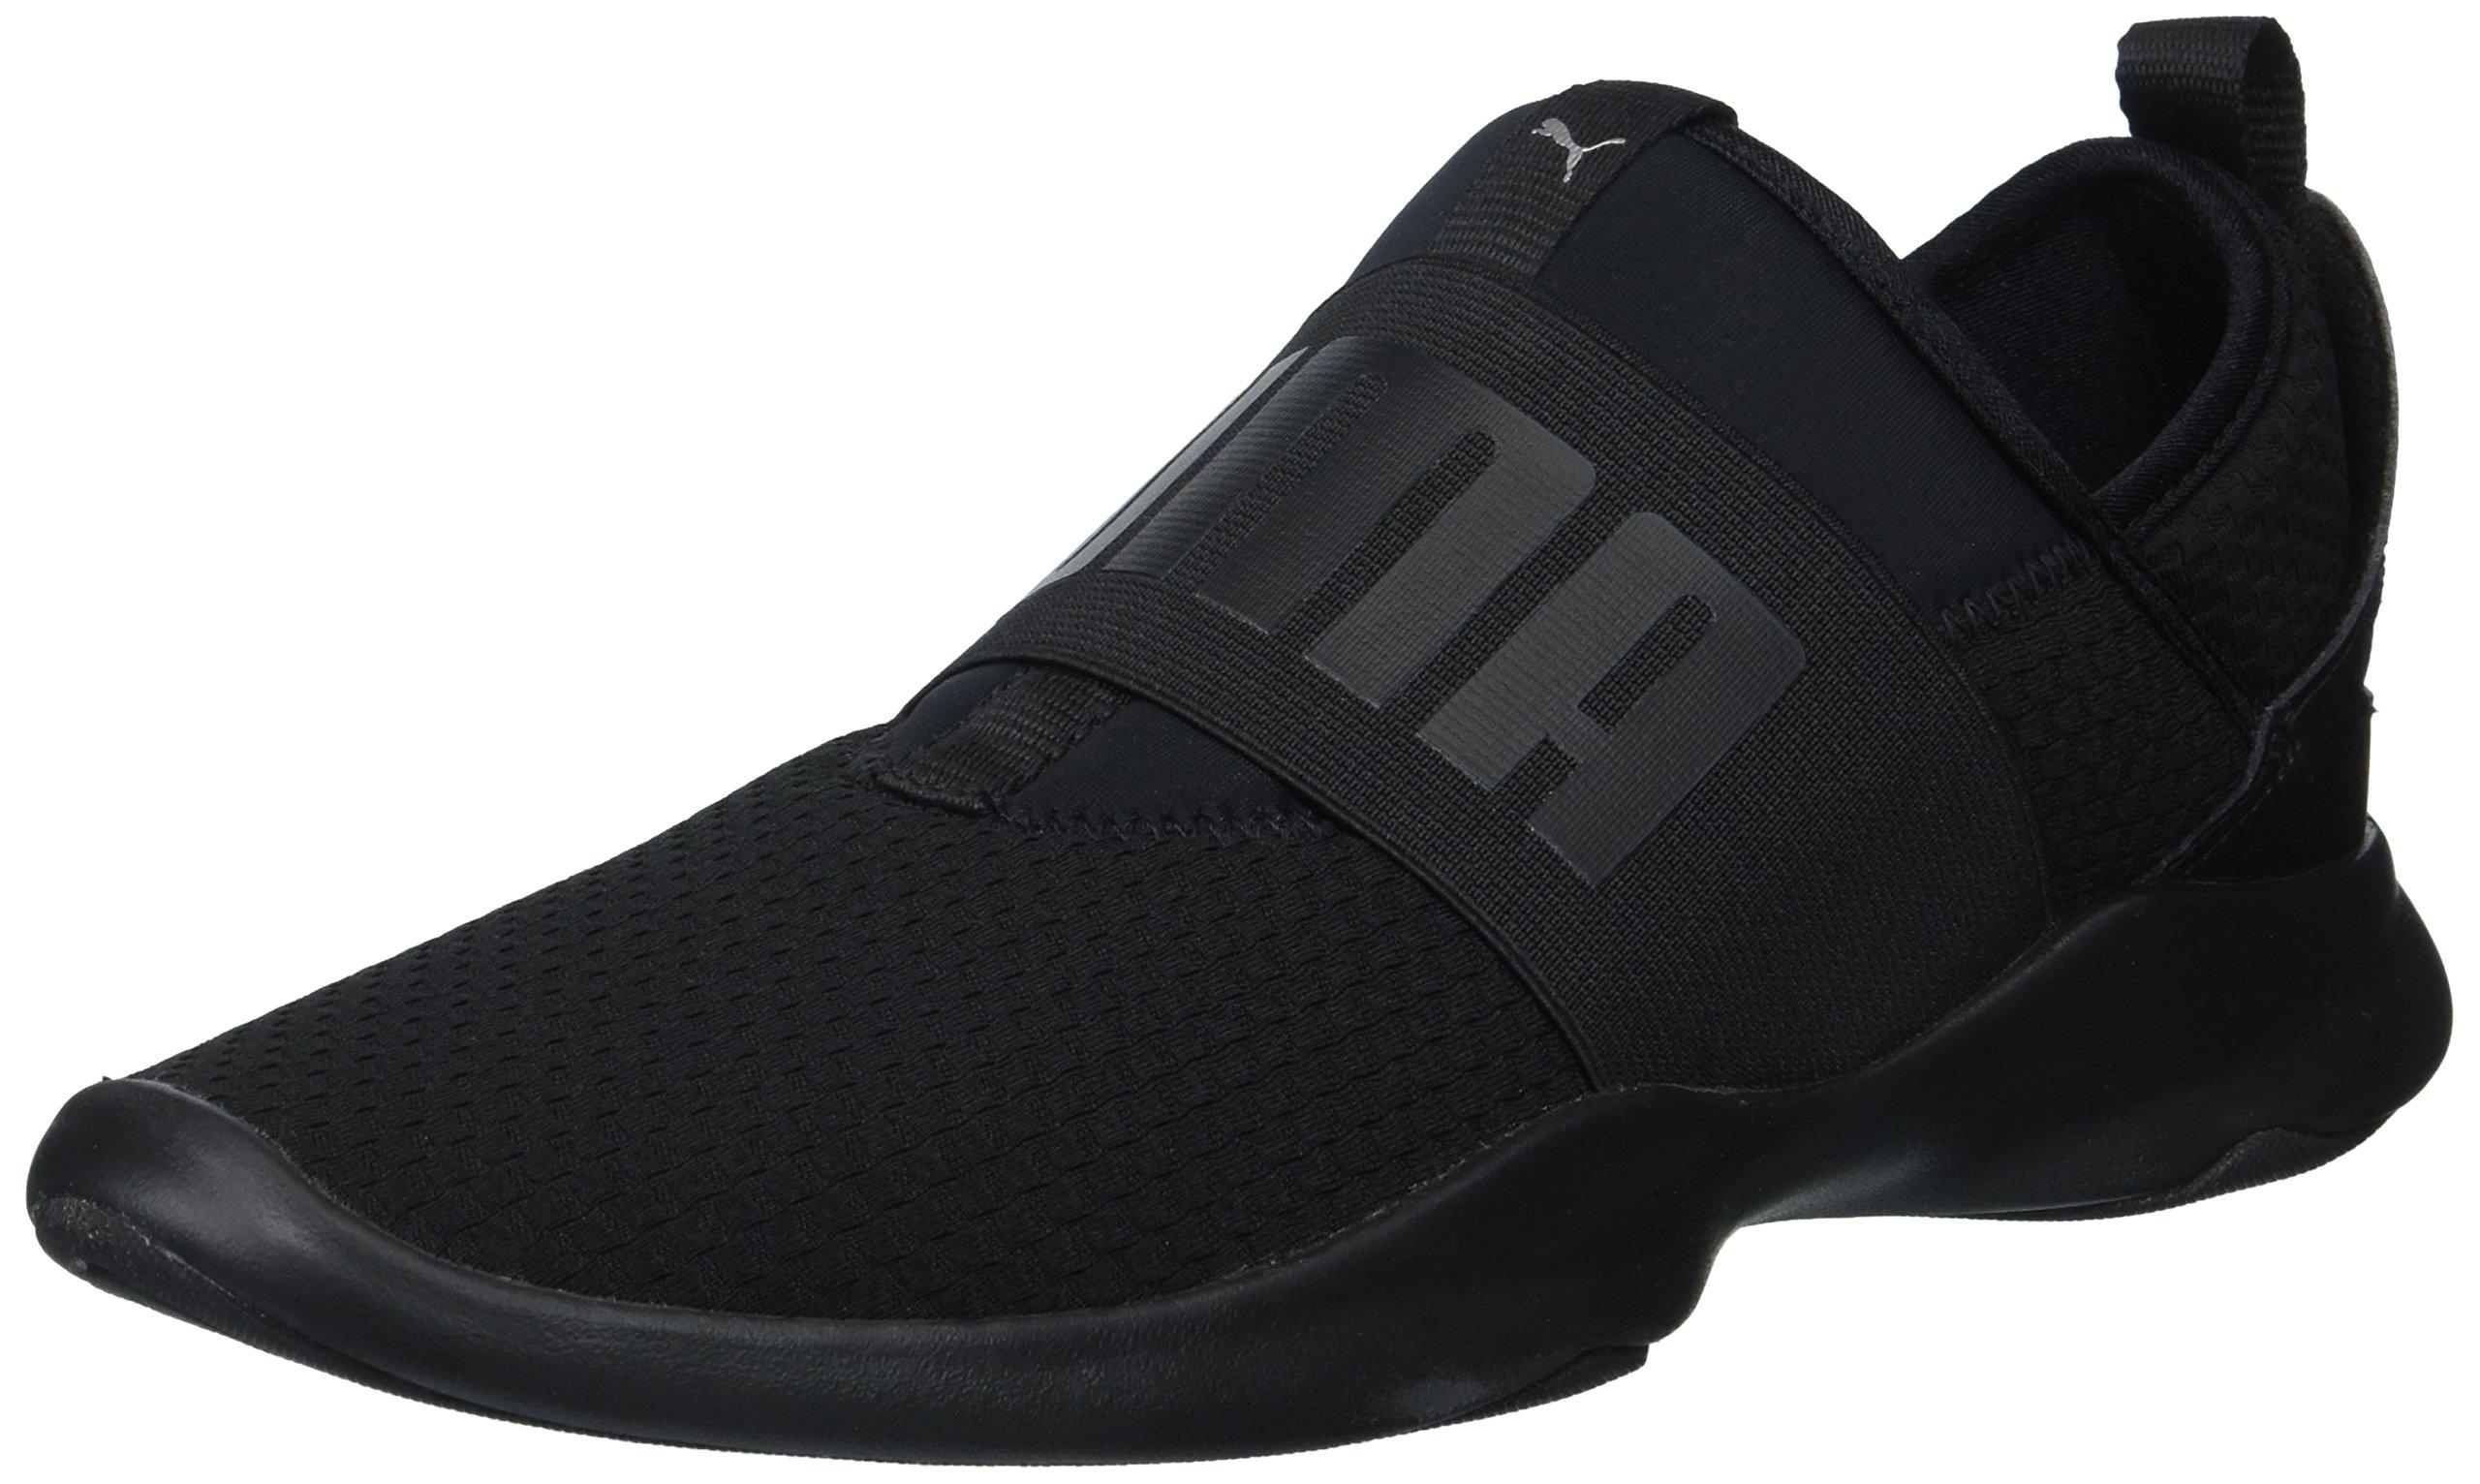 Puma Wns EpSneakers Eu Basses Black37 Dare FemmeNoir OPZuXki